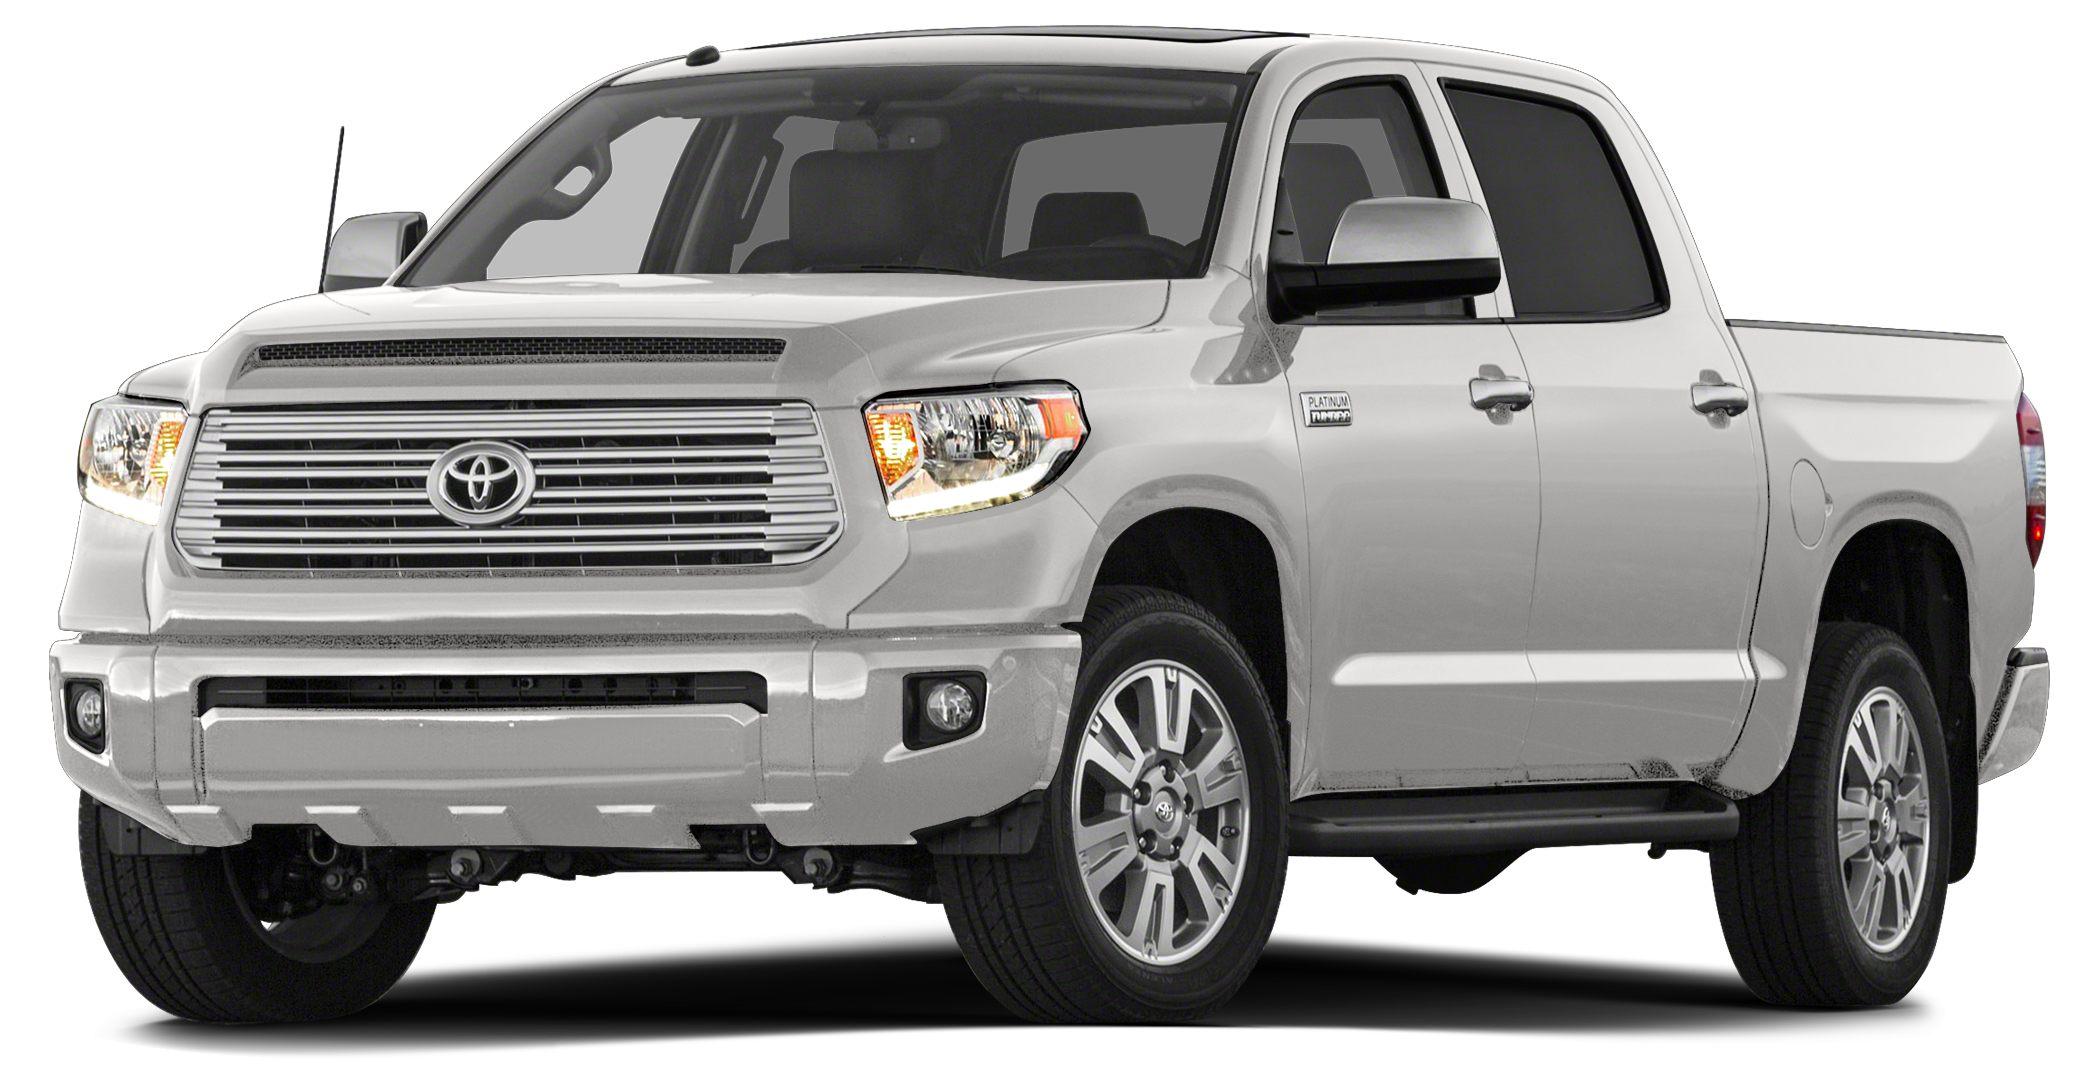 2015 Toyota Tundra Platinum 1794 Edition  Platinum Edition - NavigationGPSNAV - Super White on